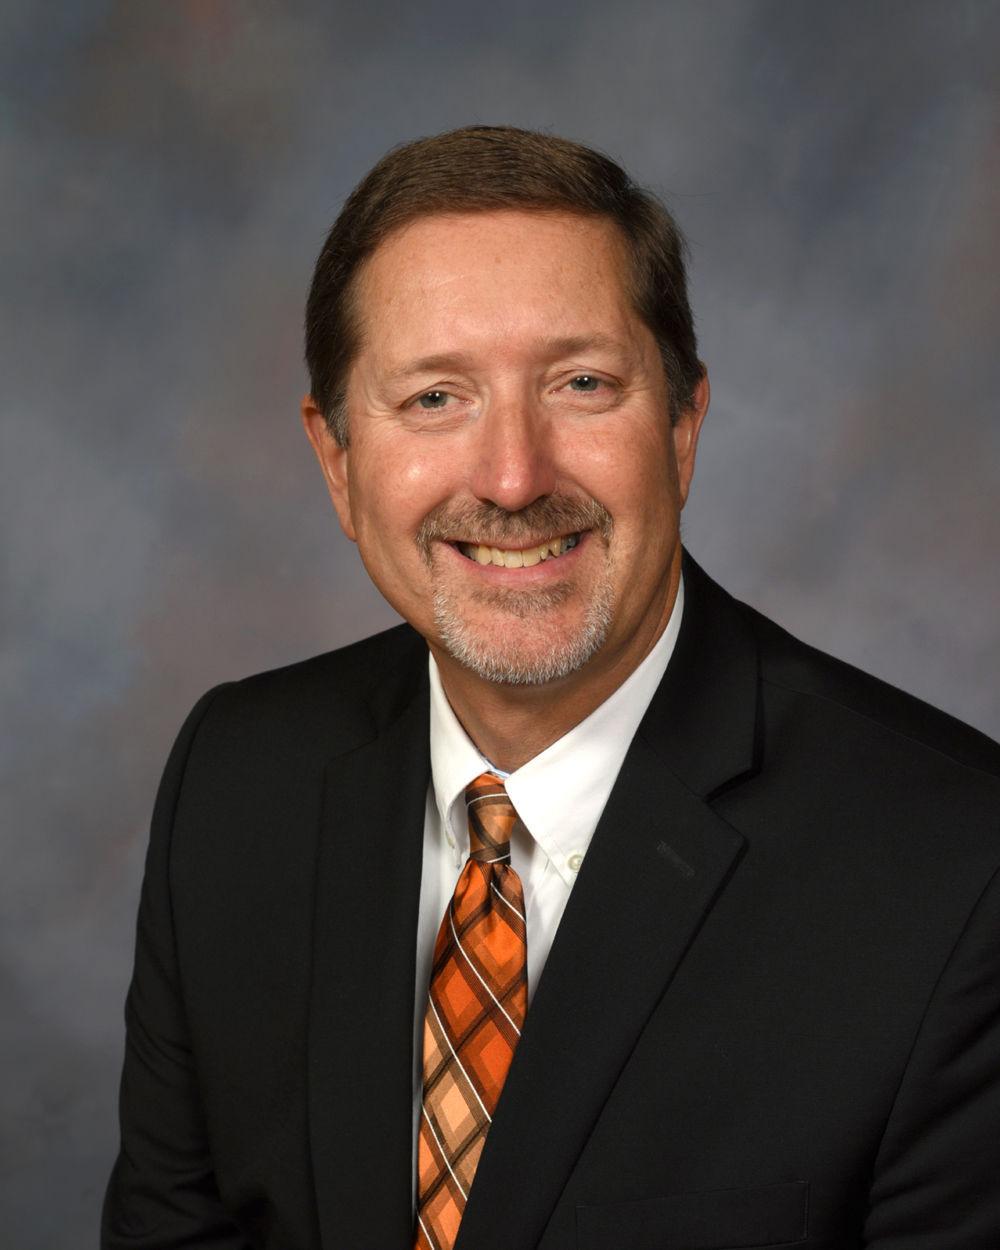 Superintendent Dan Olson